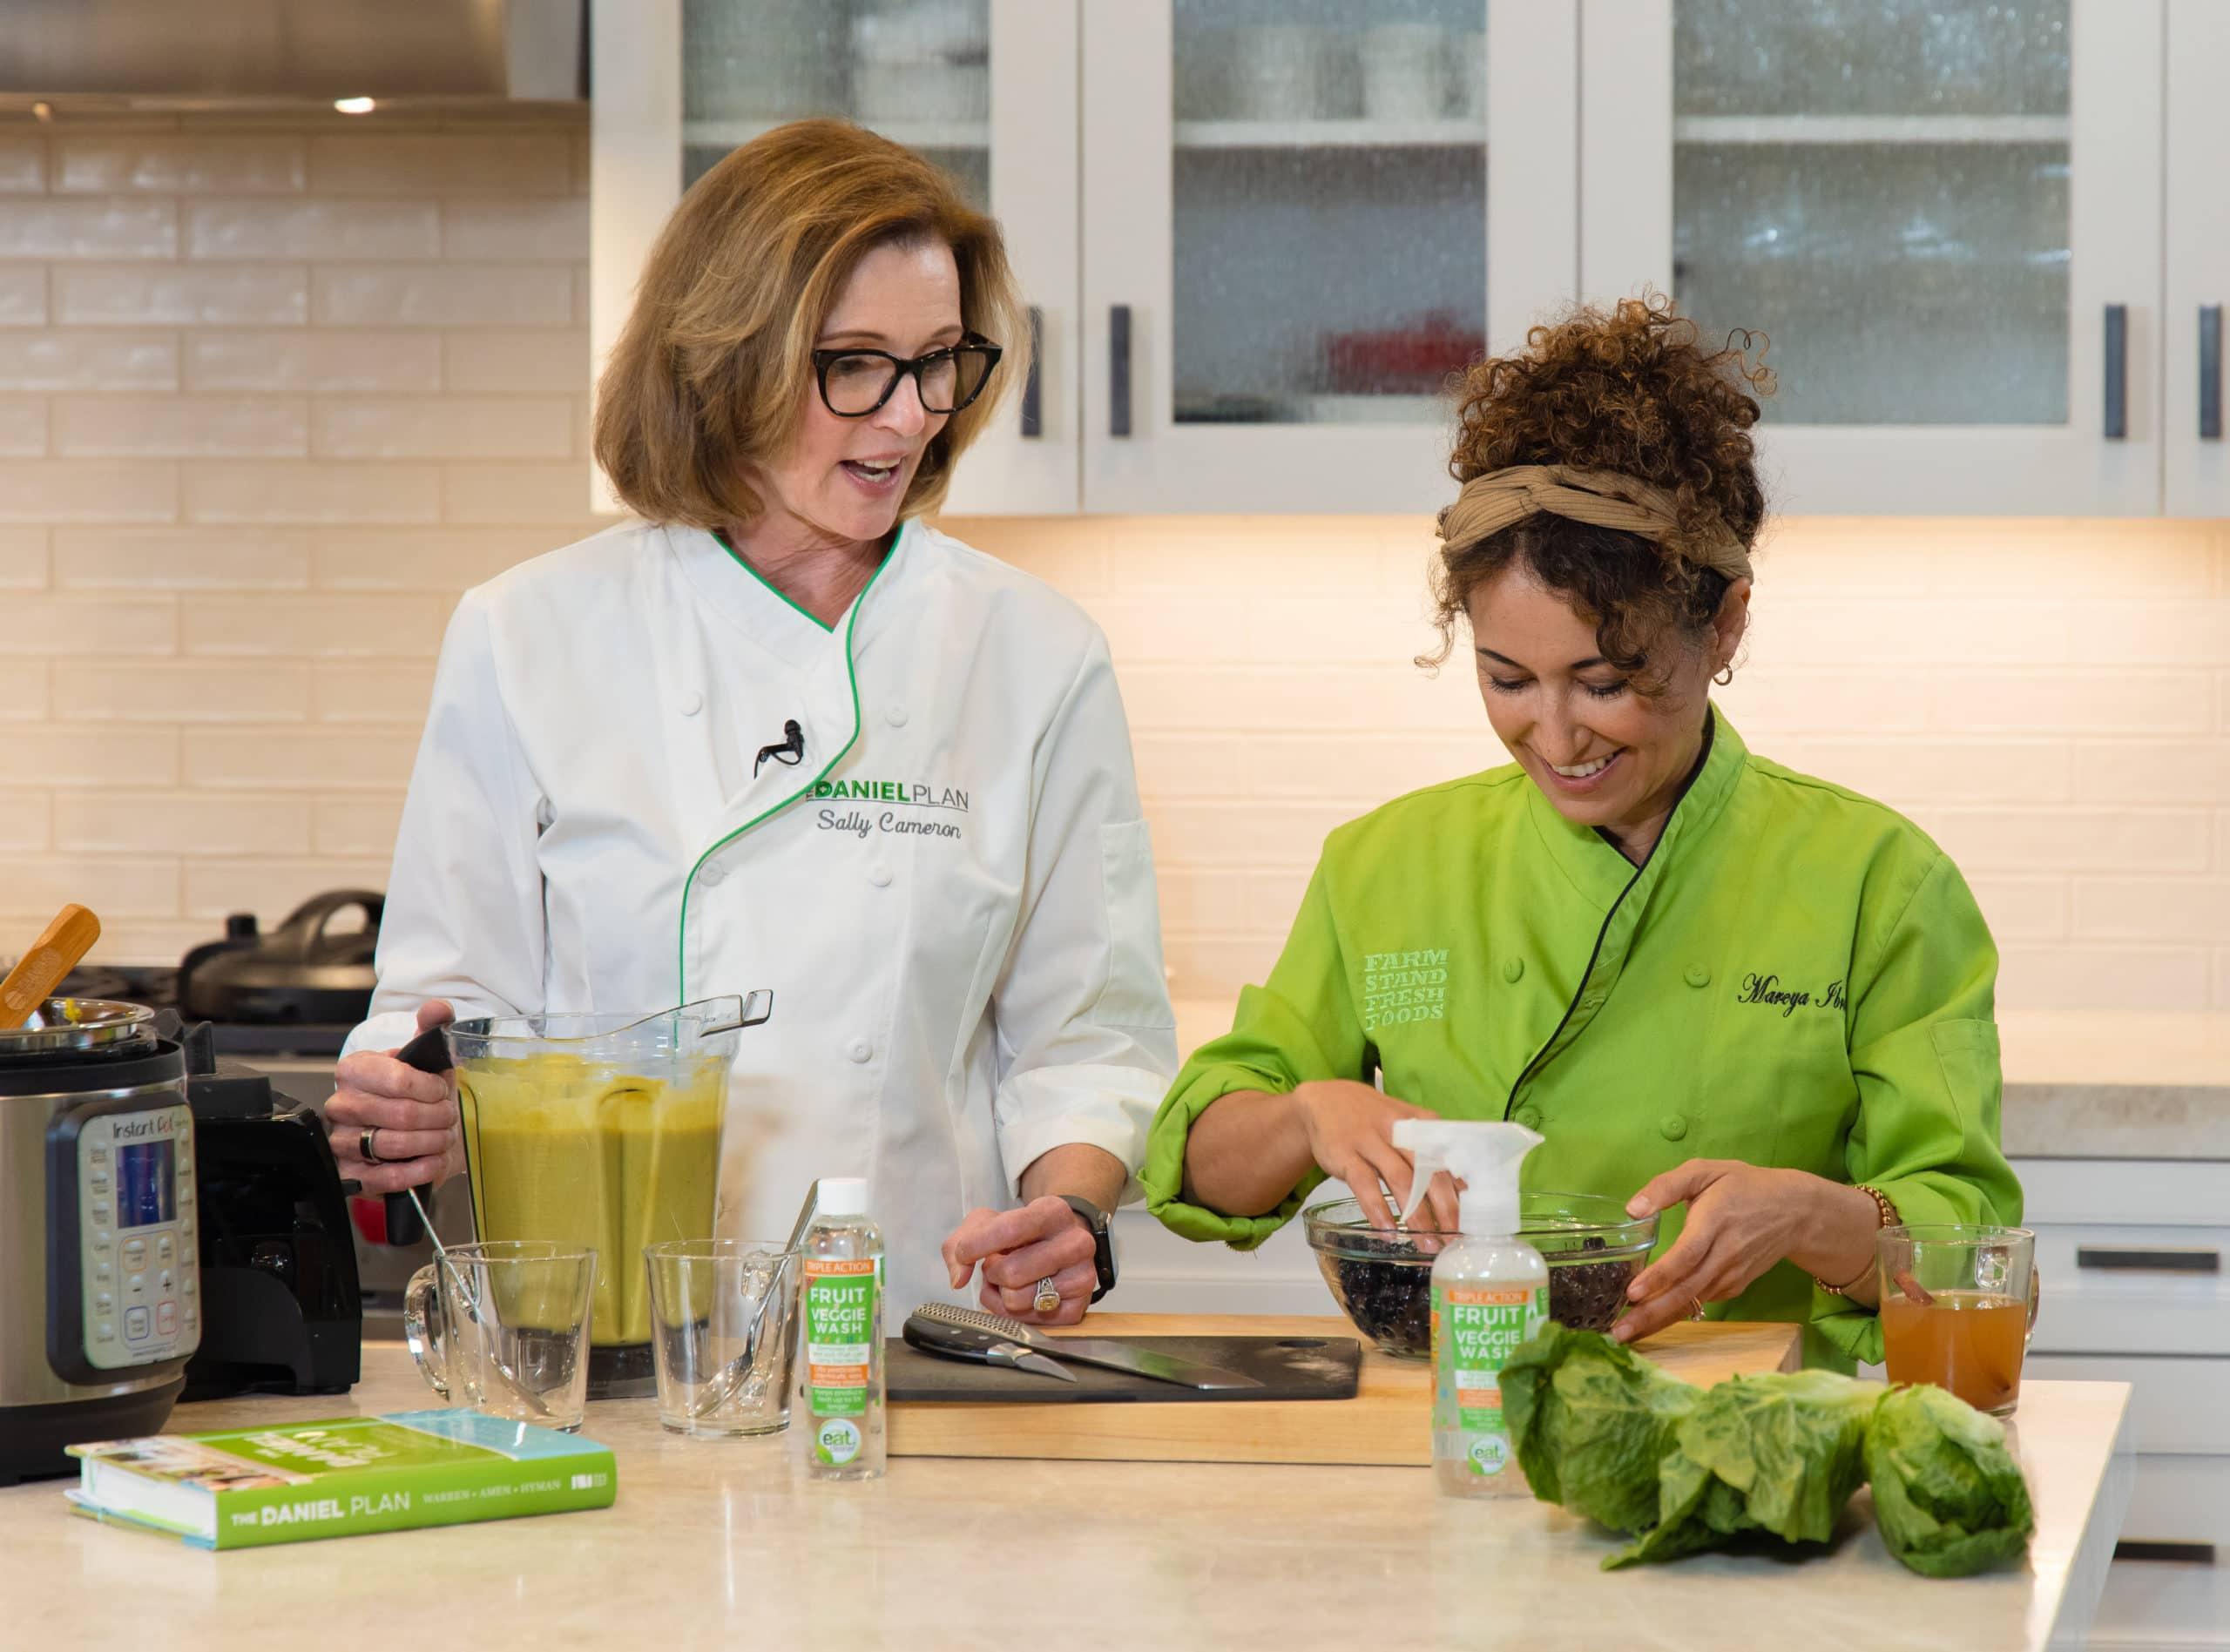 Chefs sally cameron and Mareya Ibrahim | Afoodcentriclife.com